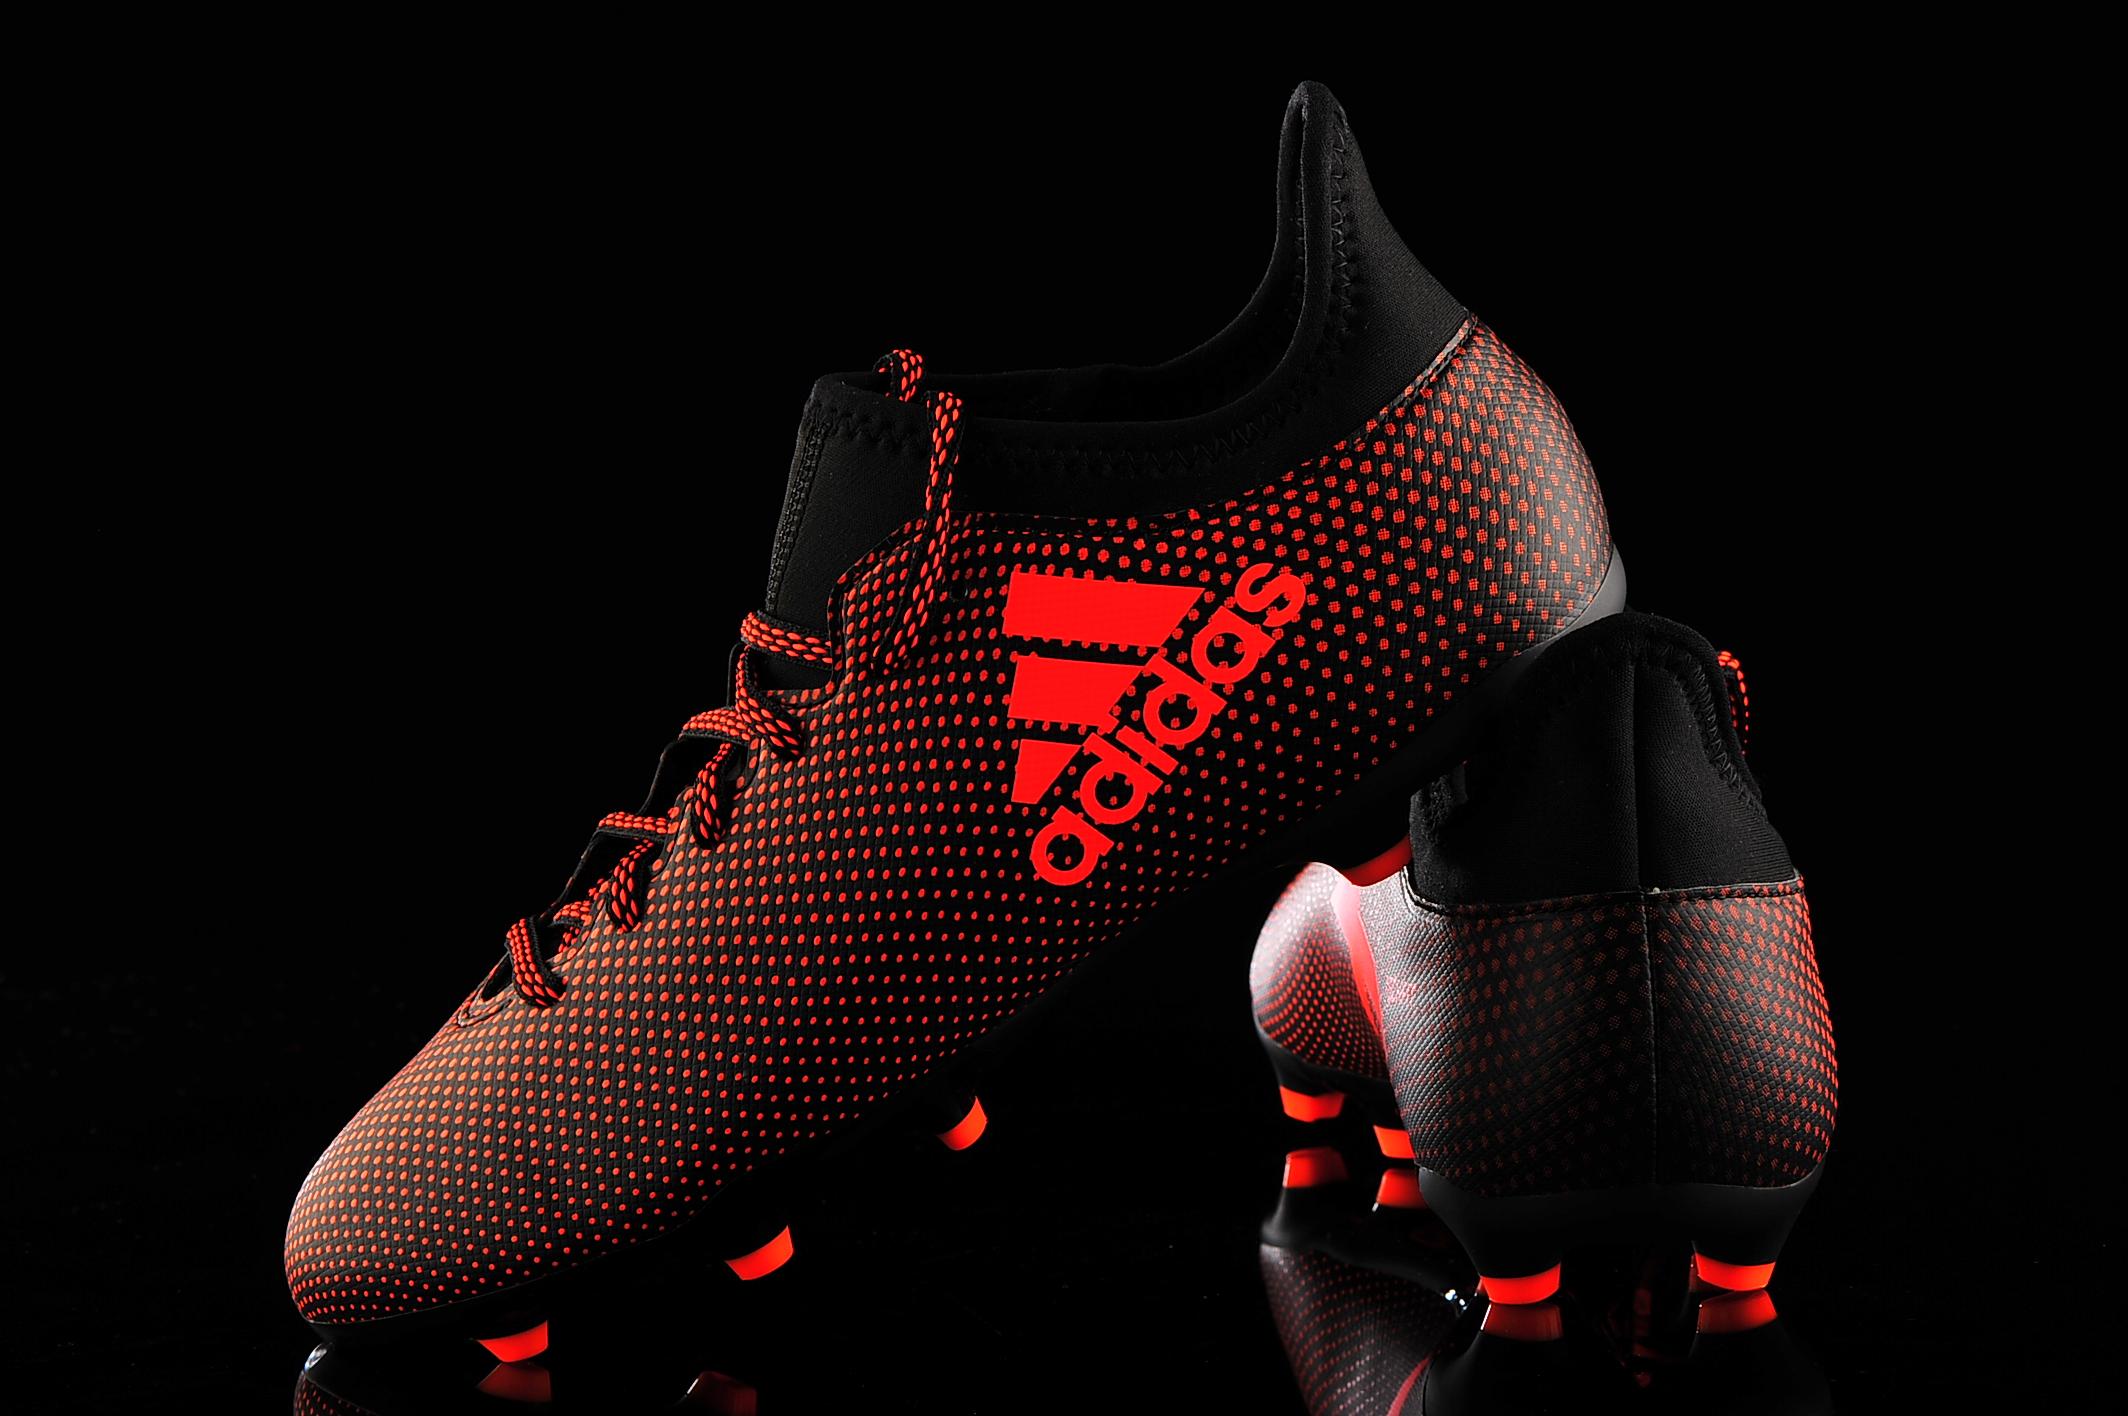 casual Perjudicial Ejercicio  adidas X 17.3 FG Junior S82368 | R-GOL.com - Football boots & equipment